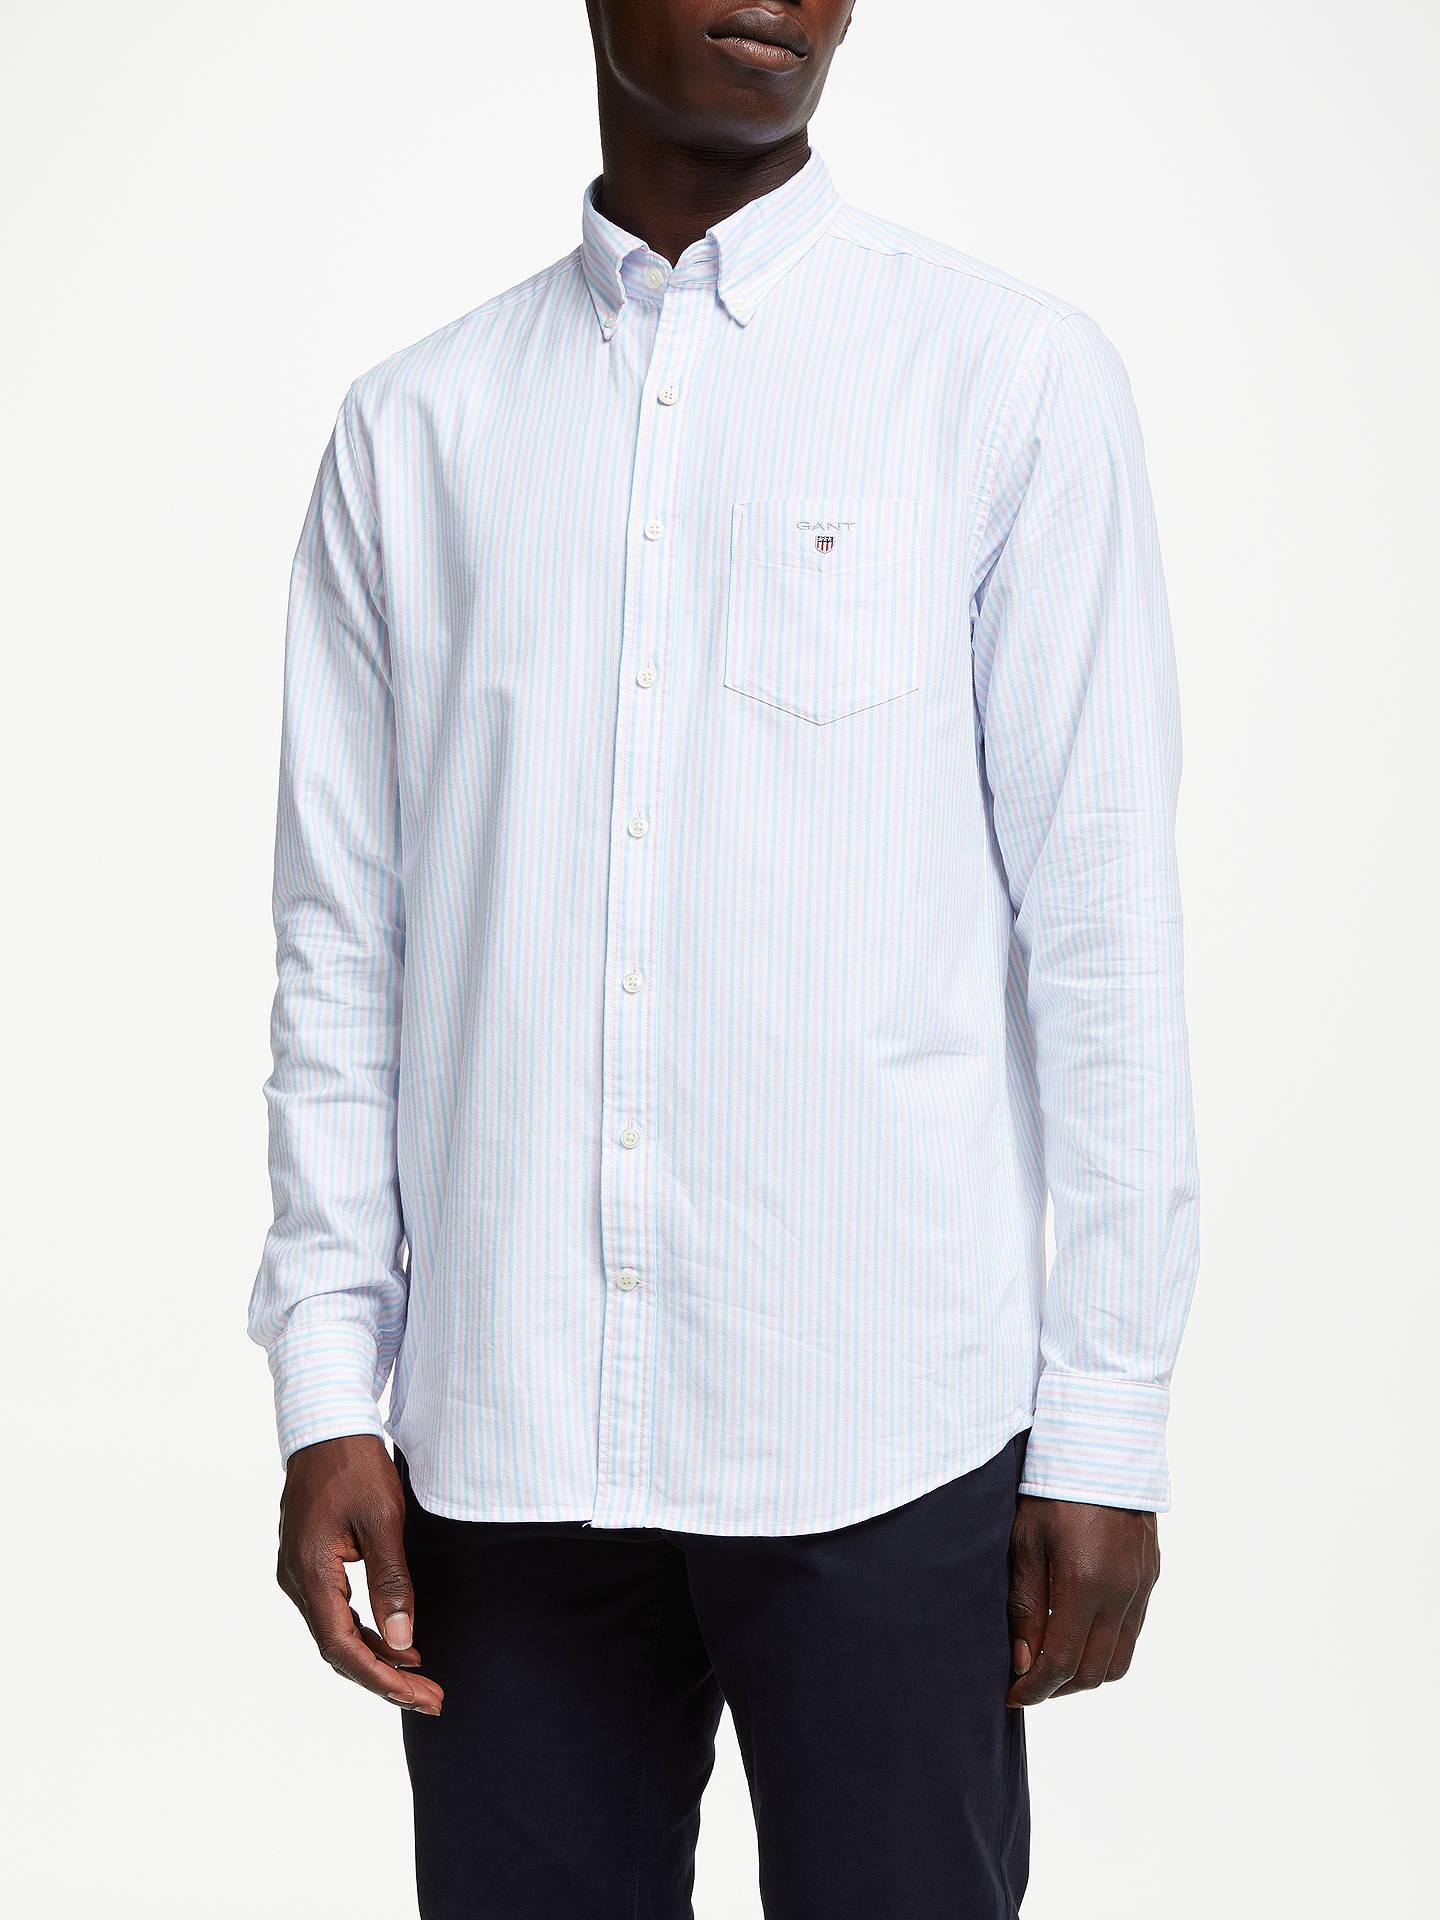 0db14f4bc29 Buy GANT Regular Fit Poplin Banker Stripe Shirt